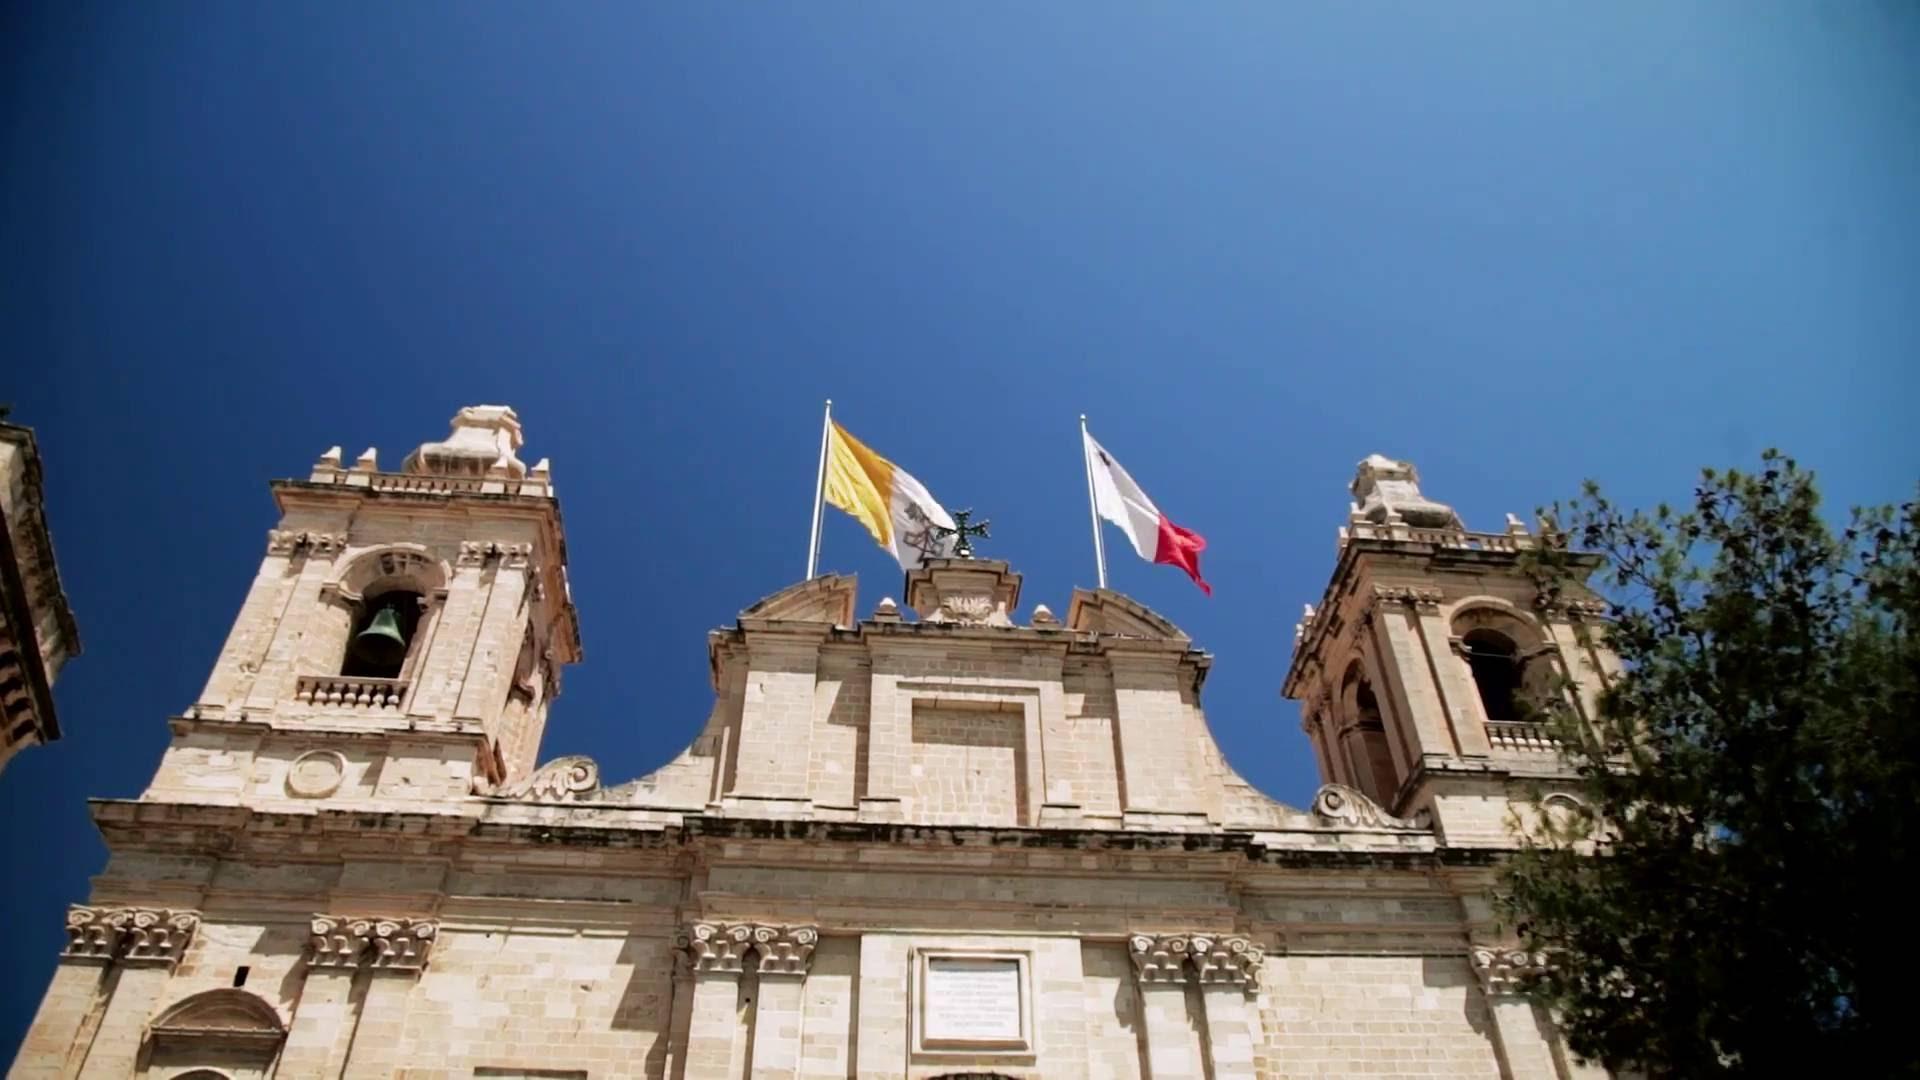 Unibet Open - Enjoying the Sights in Malta!